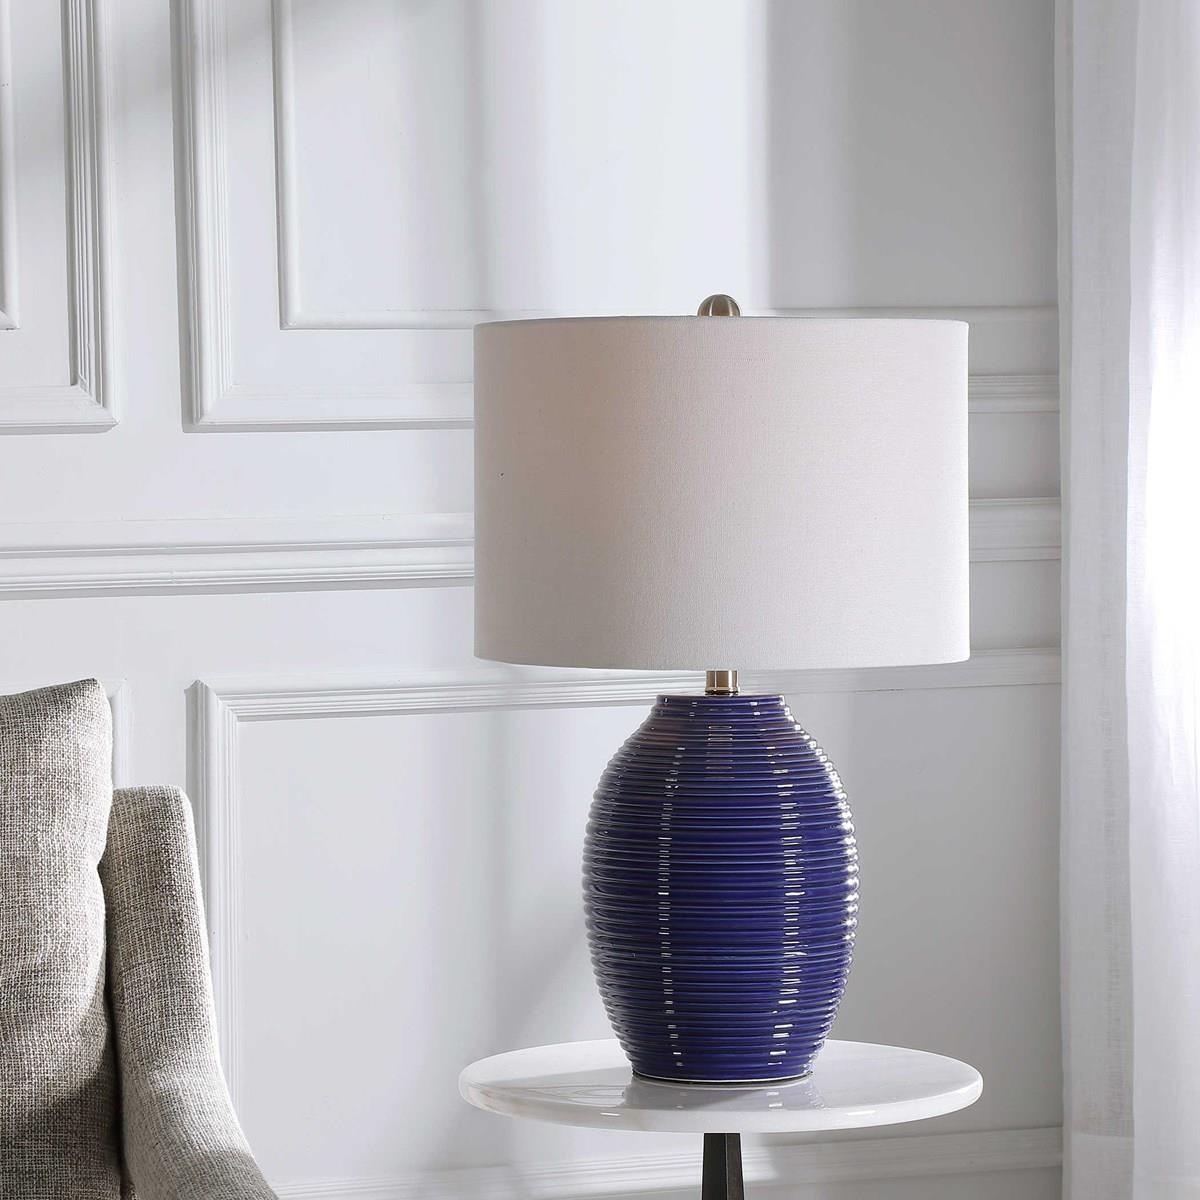 JULIETTE TABLE LAMP